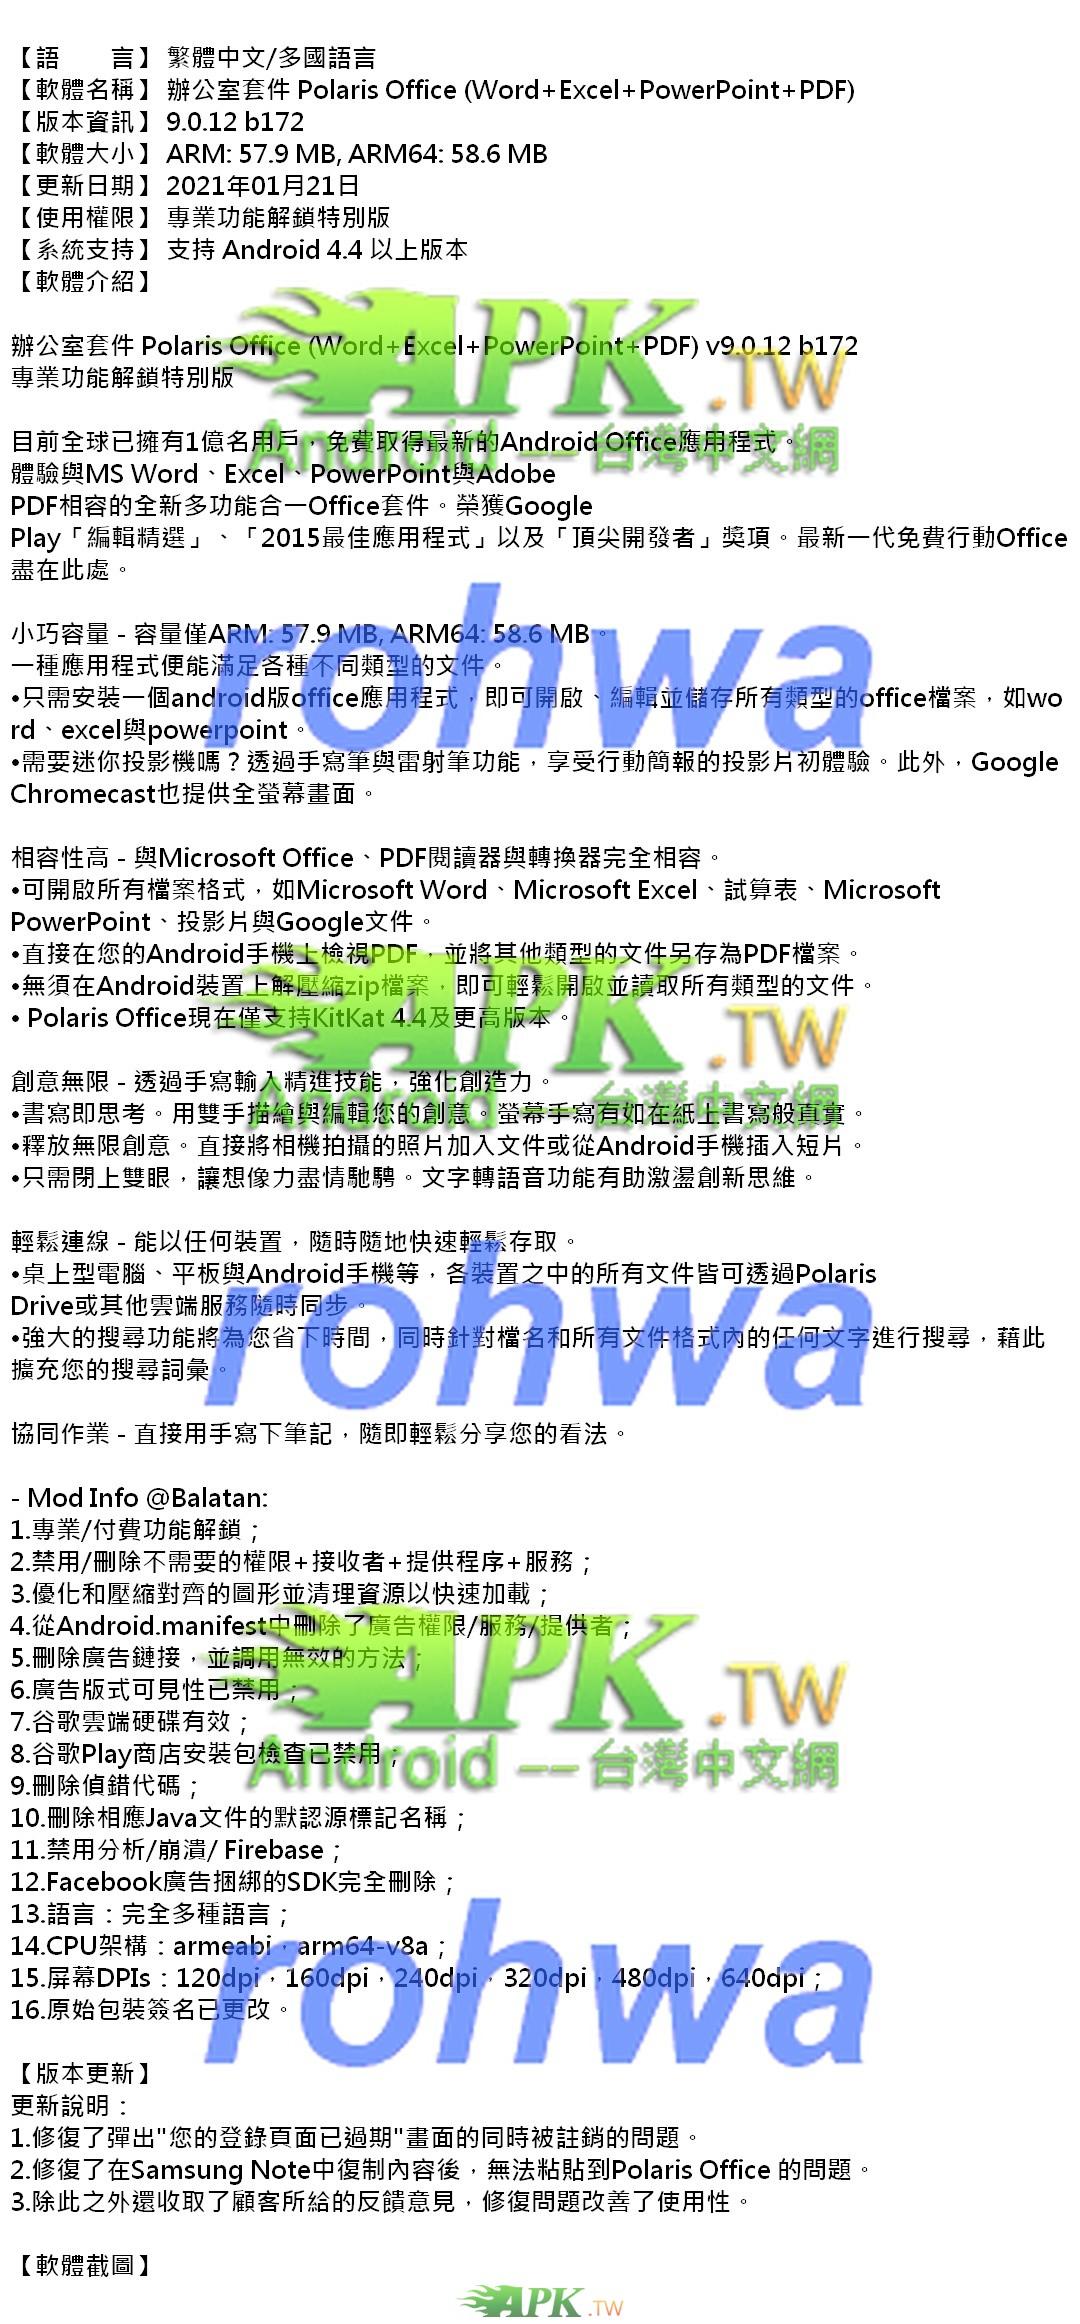 PolarisOffice_Pro_9.0.12_.jpg